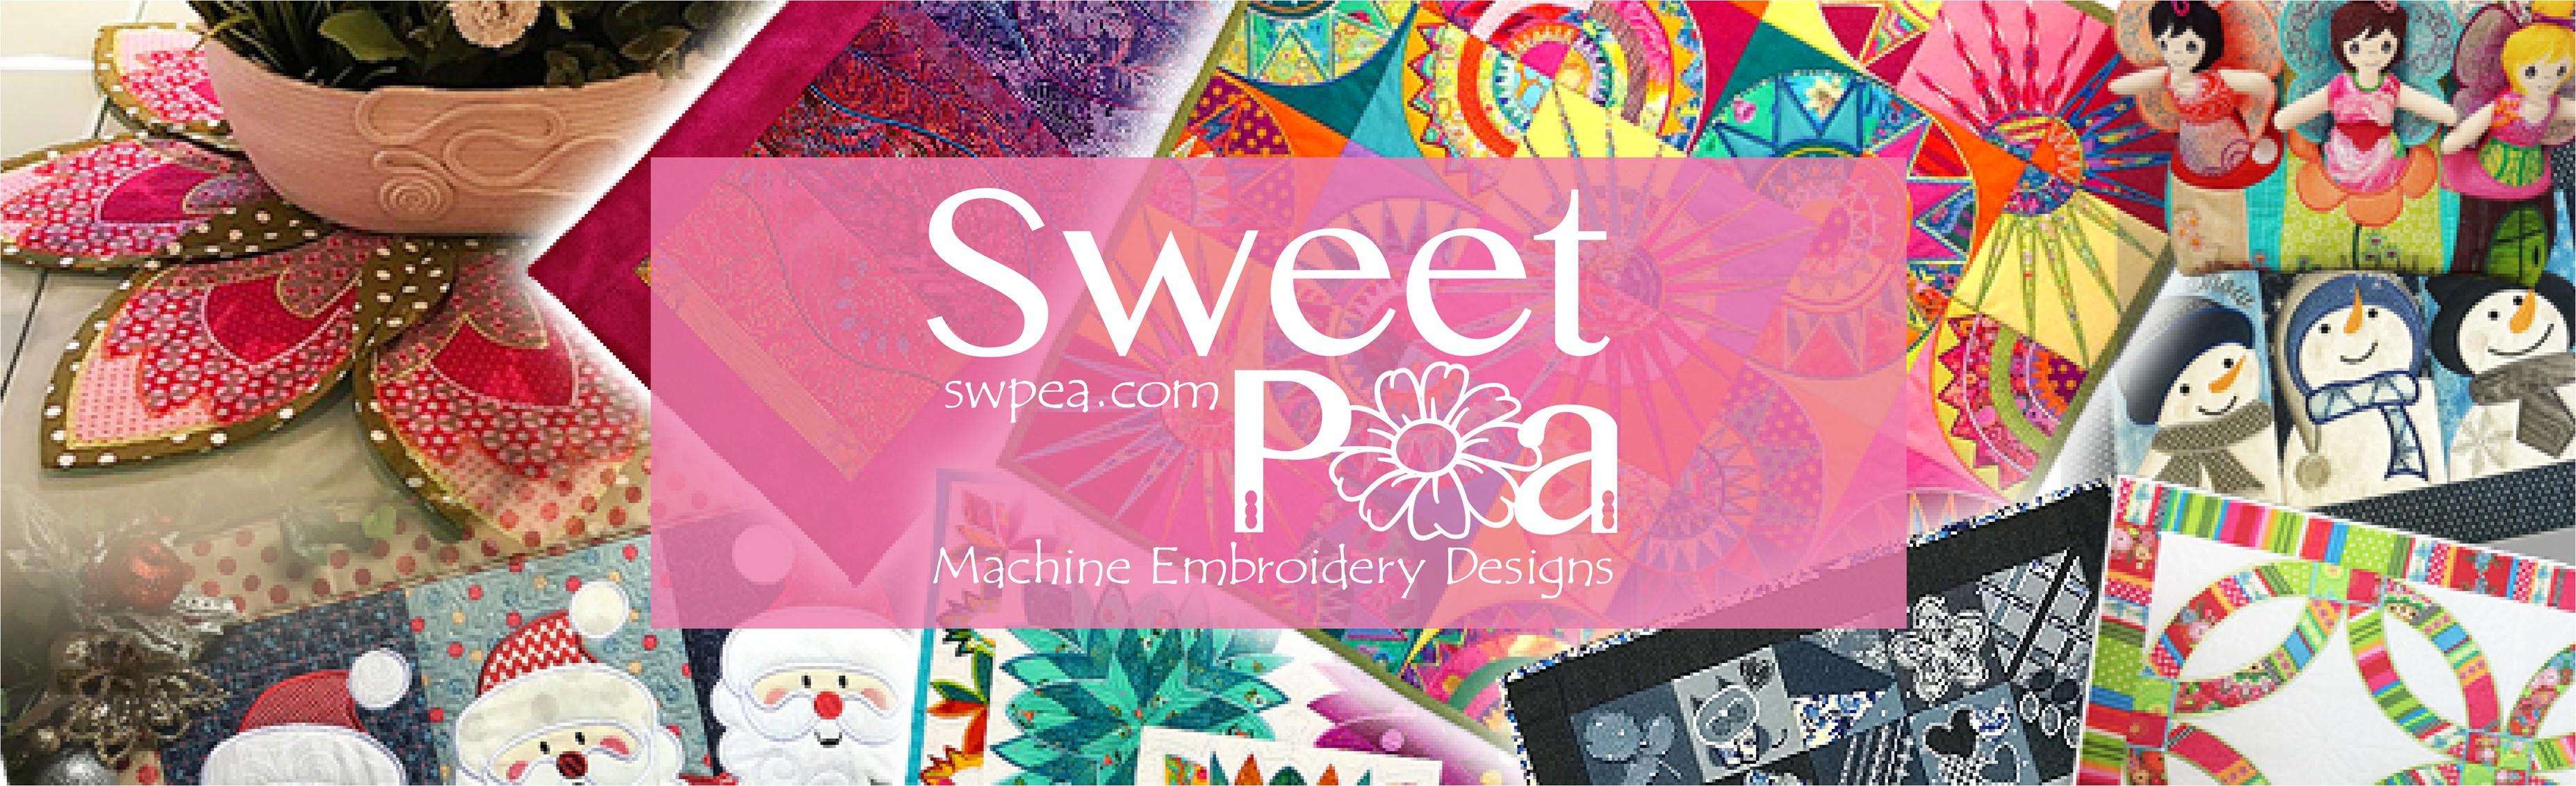 Sweet Pea Machine Embroidery Designs Linkedin